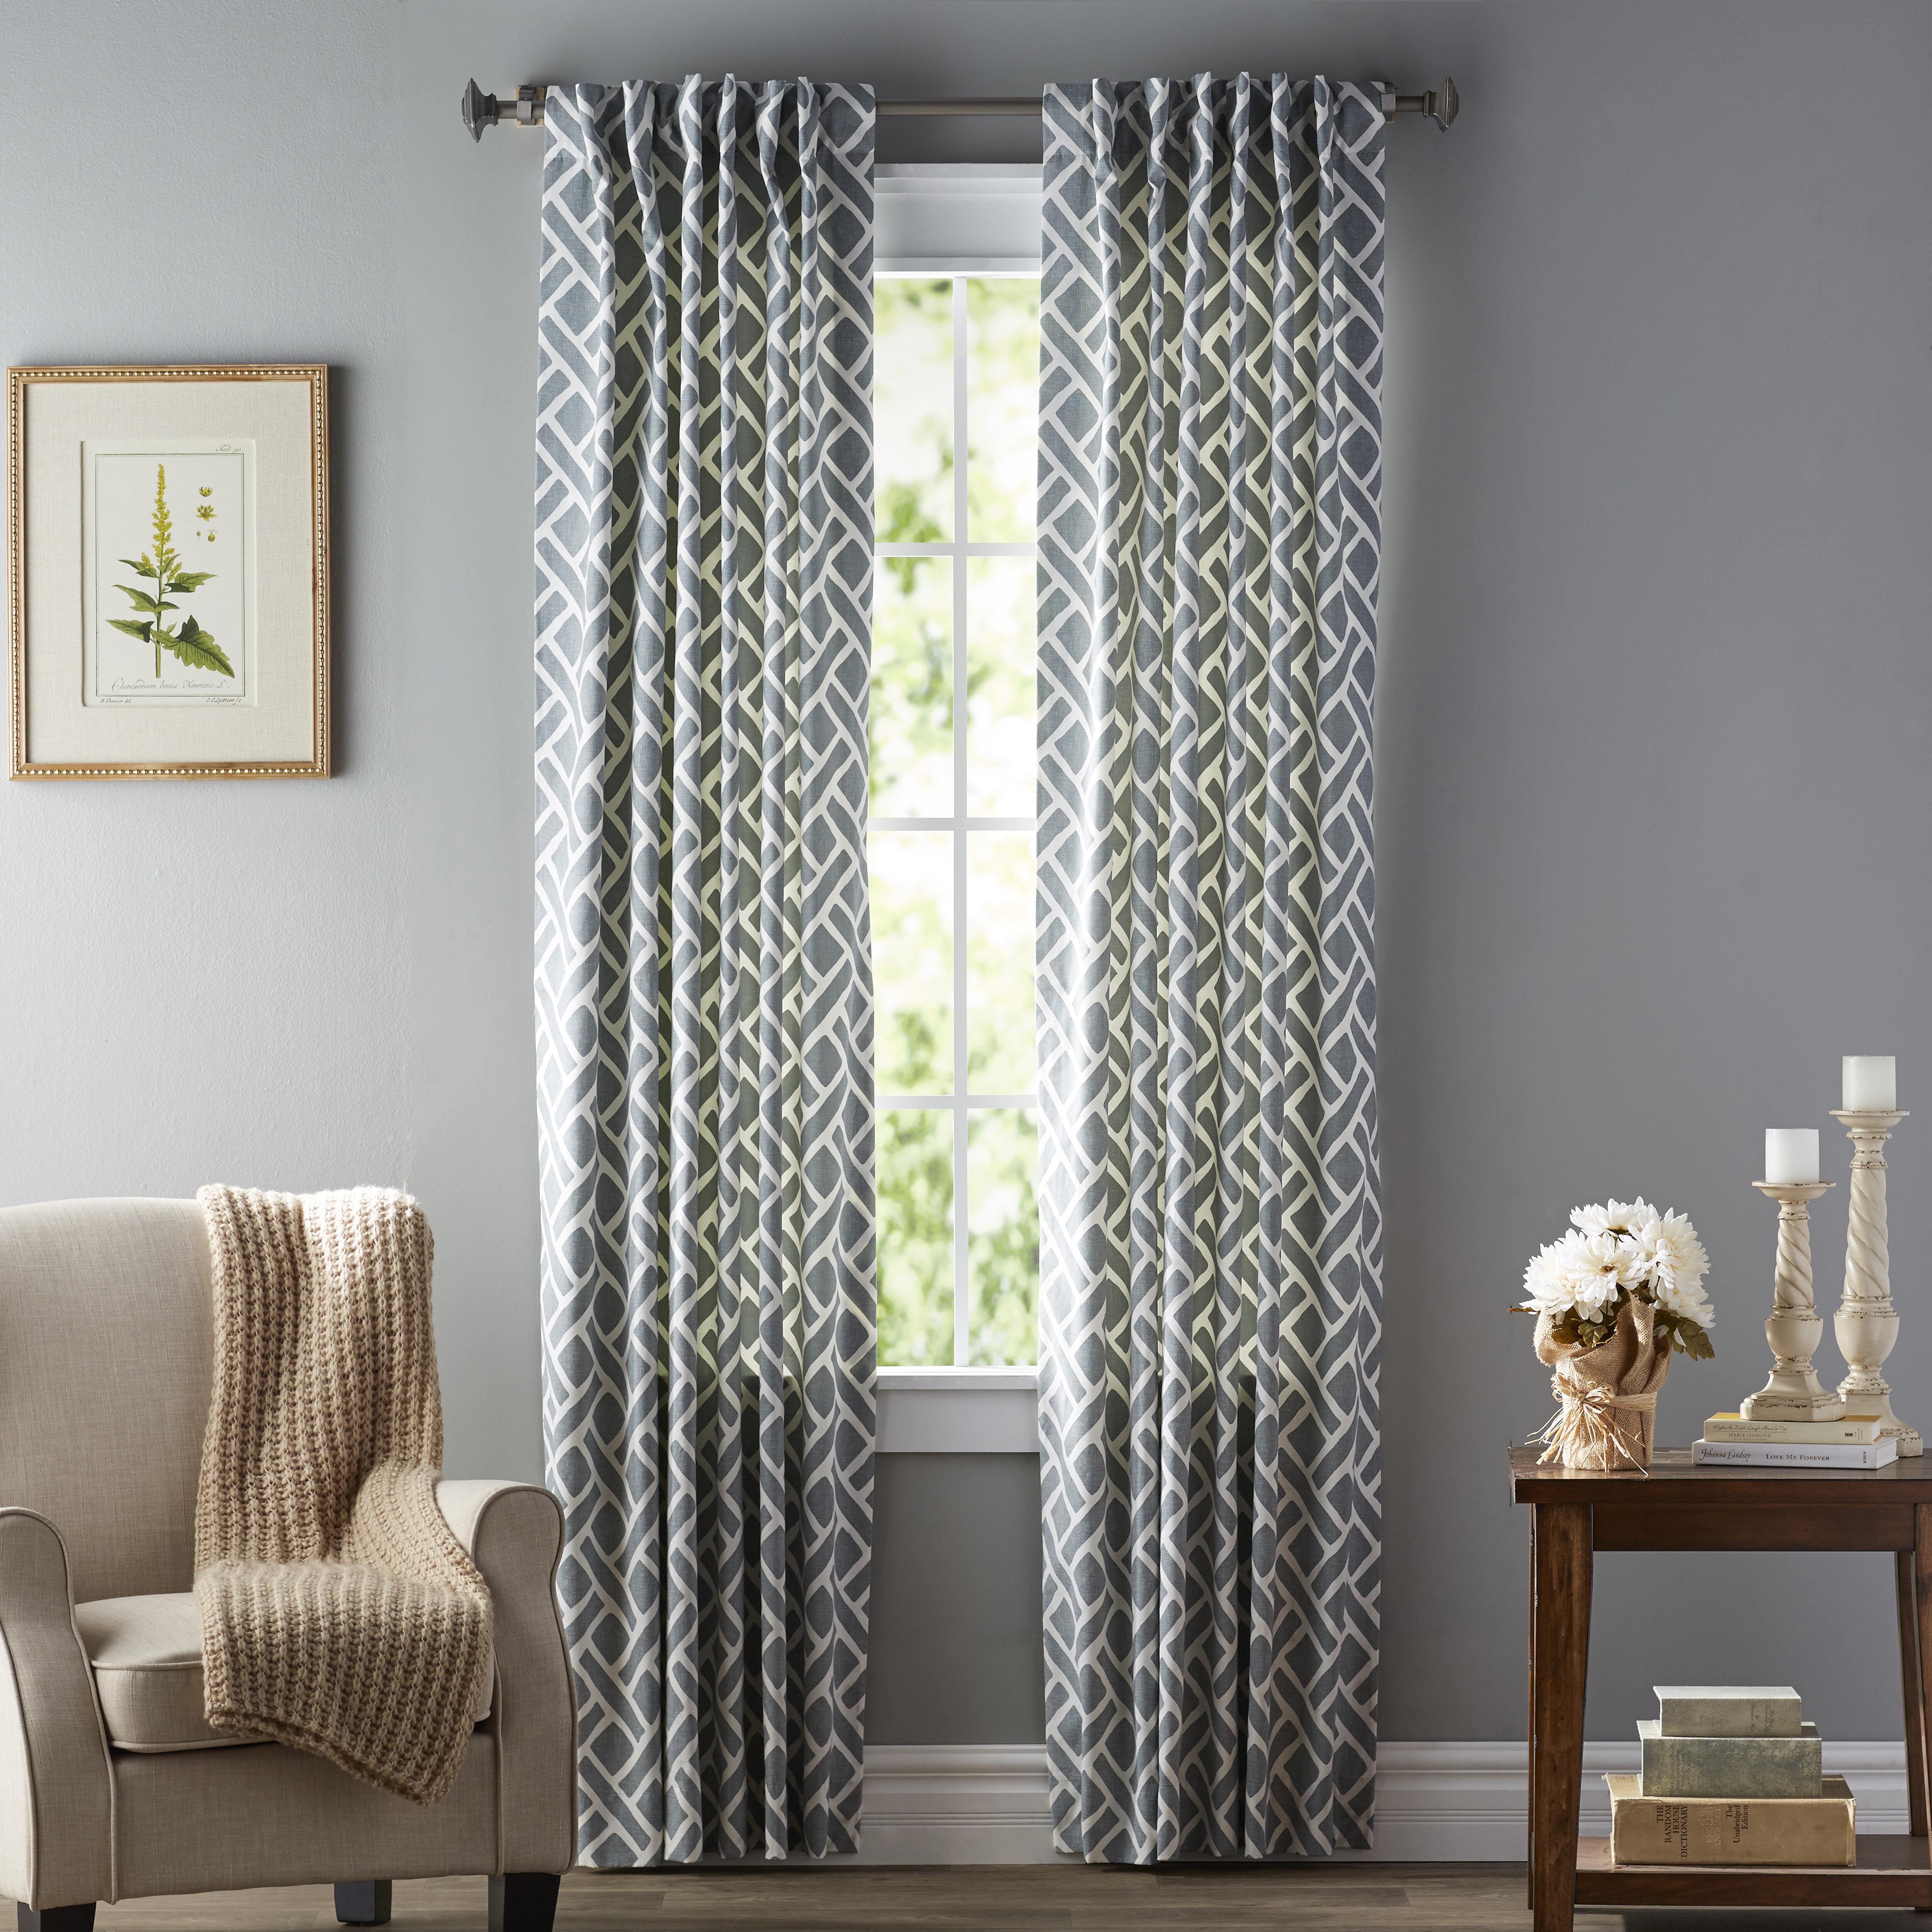 Langley Street Berumen Geometric Room Darkening Rod Pocket With Luxury Collection Summit Sheer Curtain Panel Pairs (View 11 of 20)